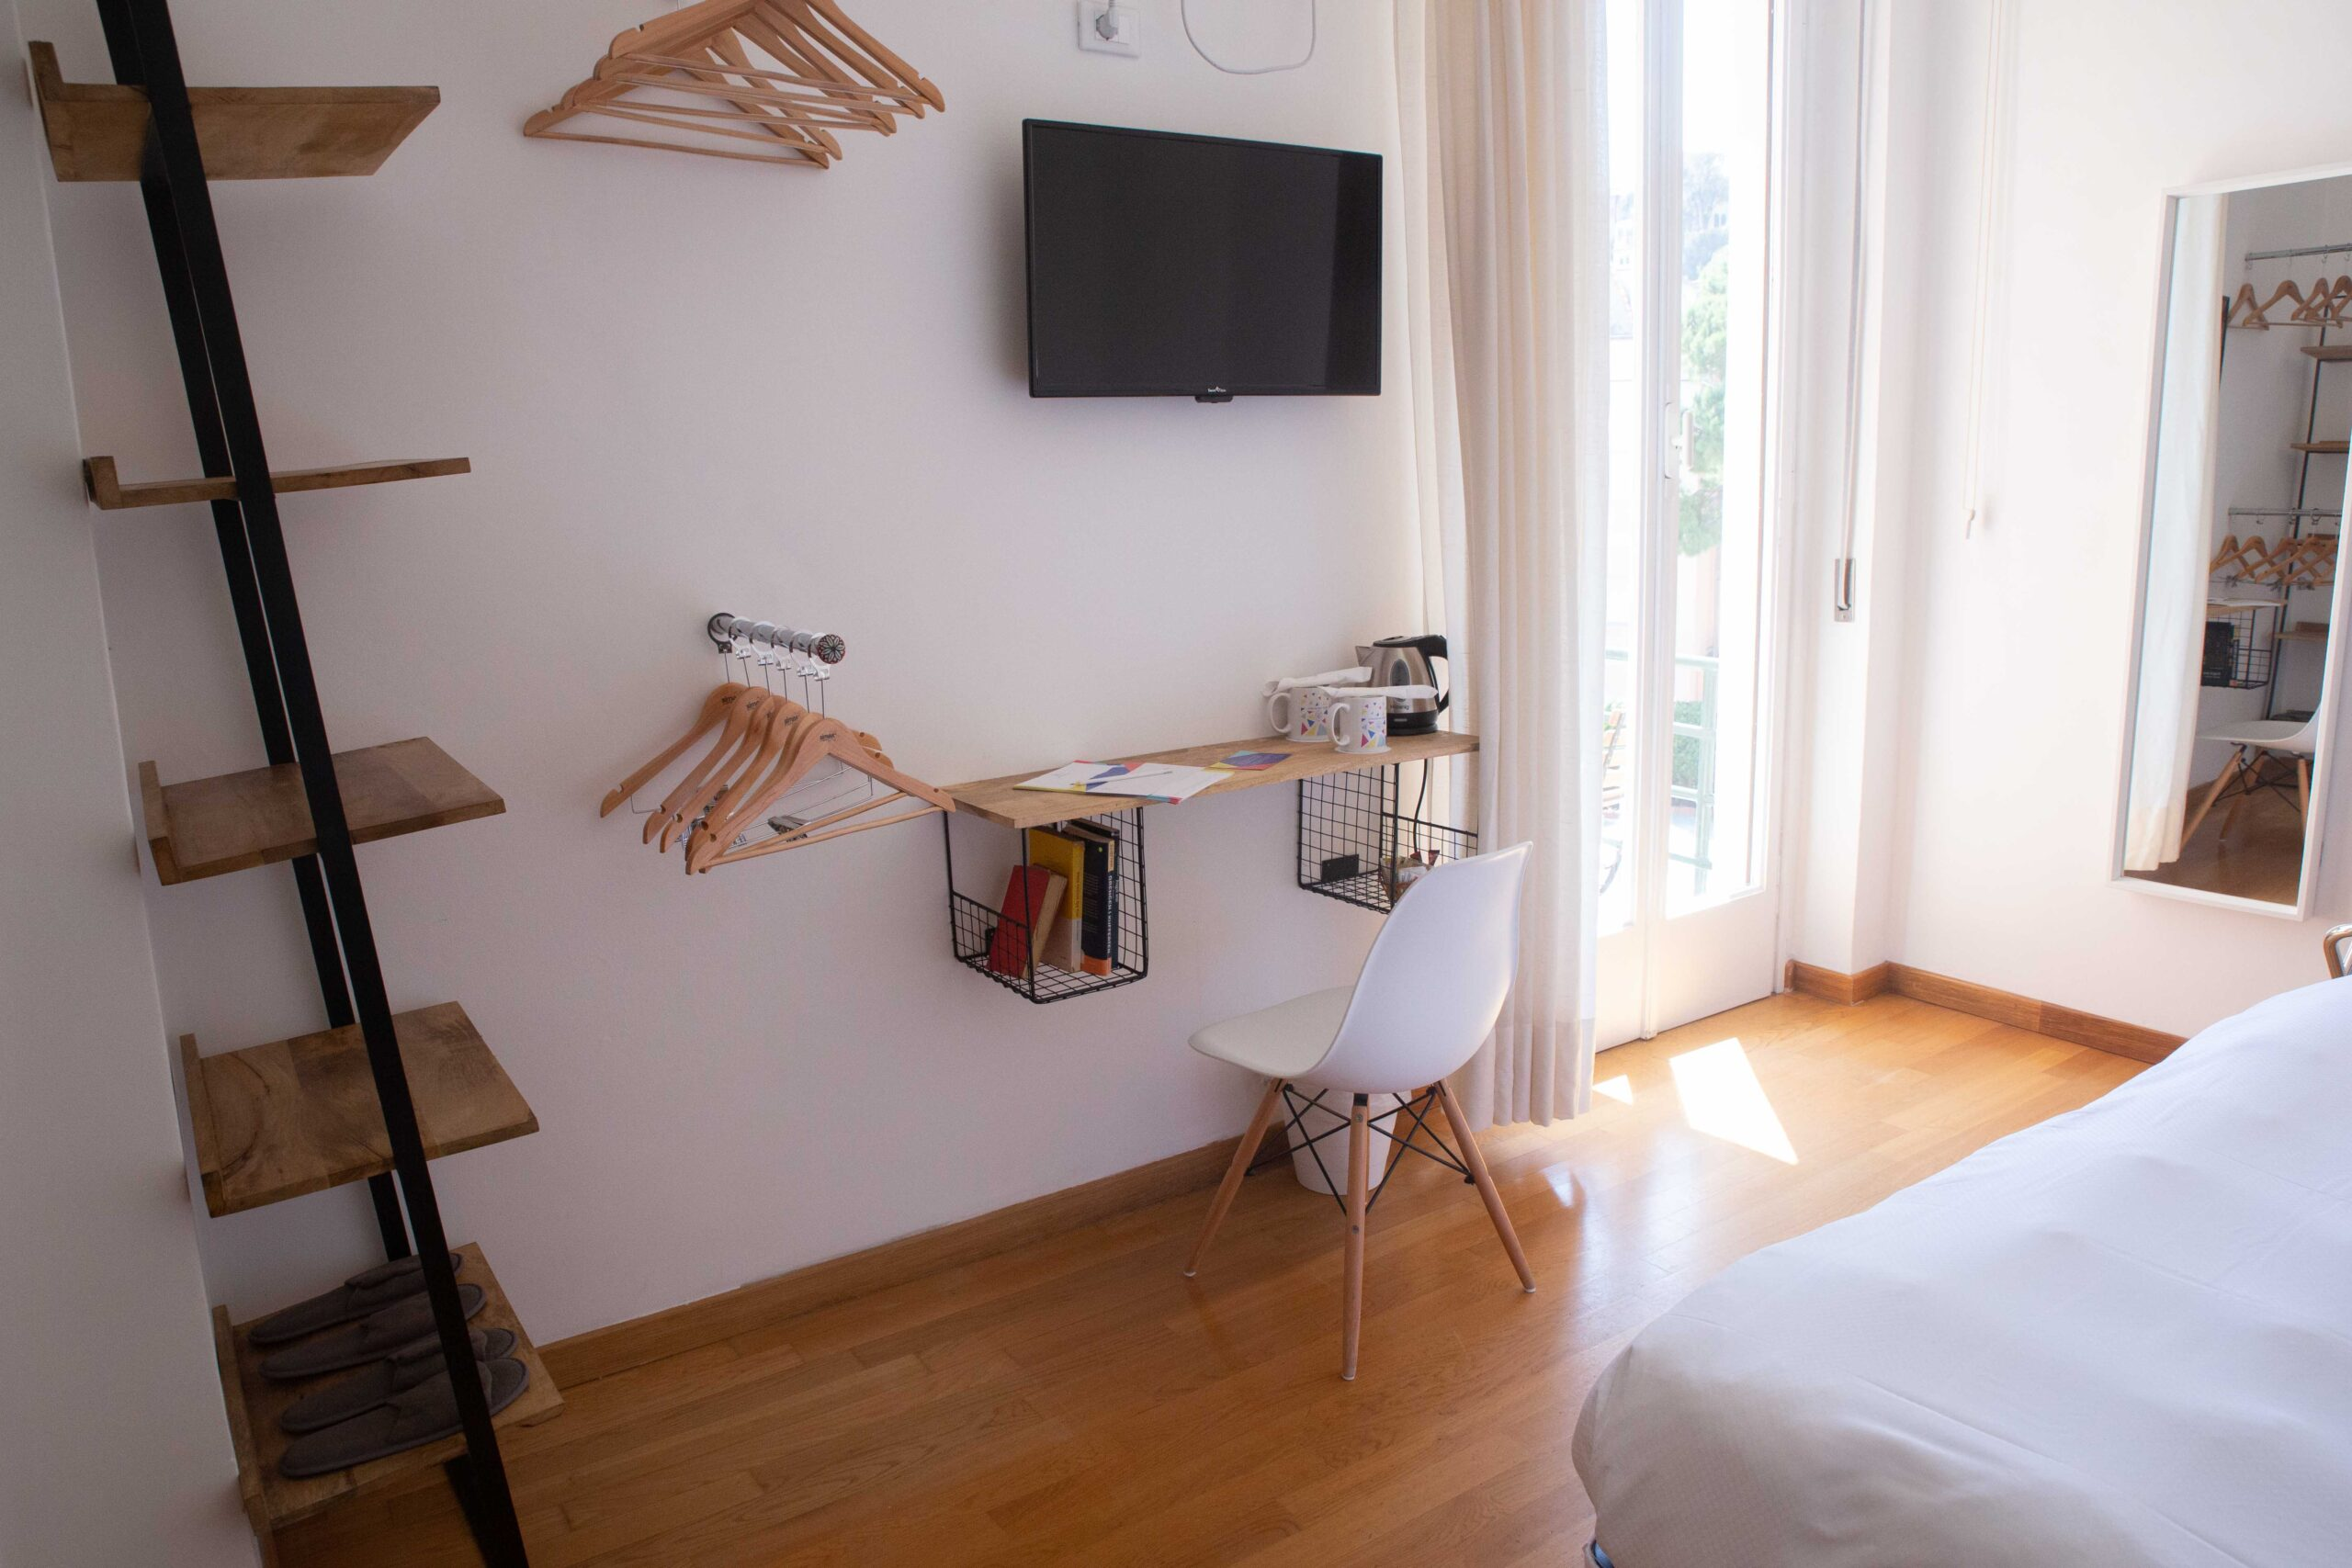 Hotel San Michele 4 Stelle | San Michele Celle Ligure